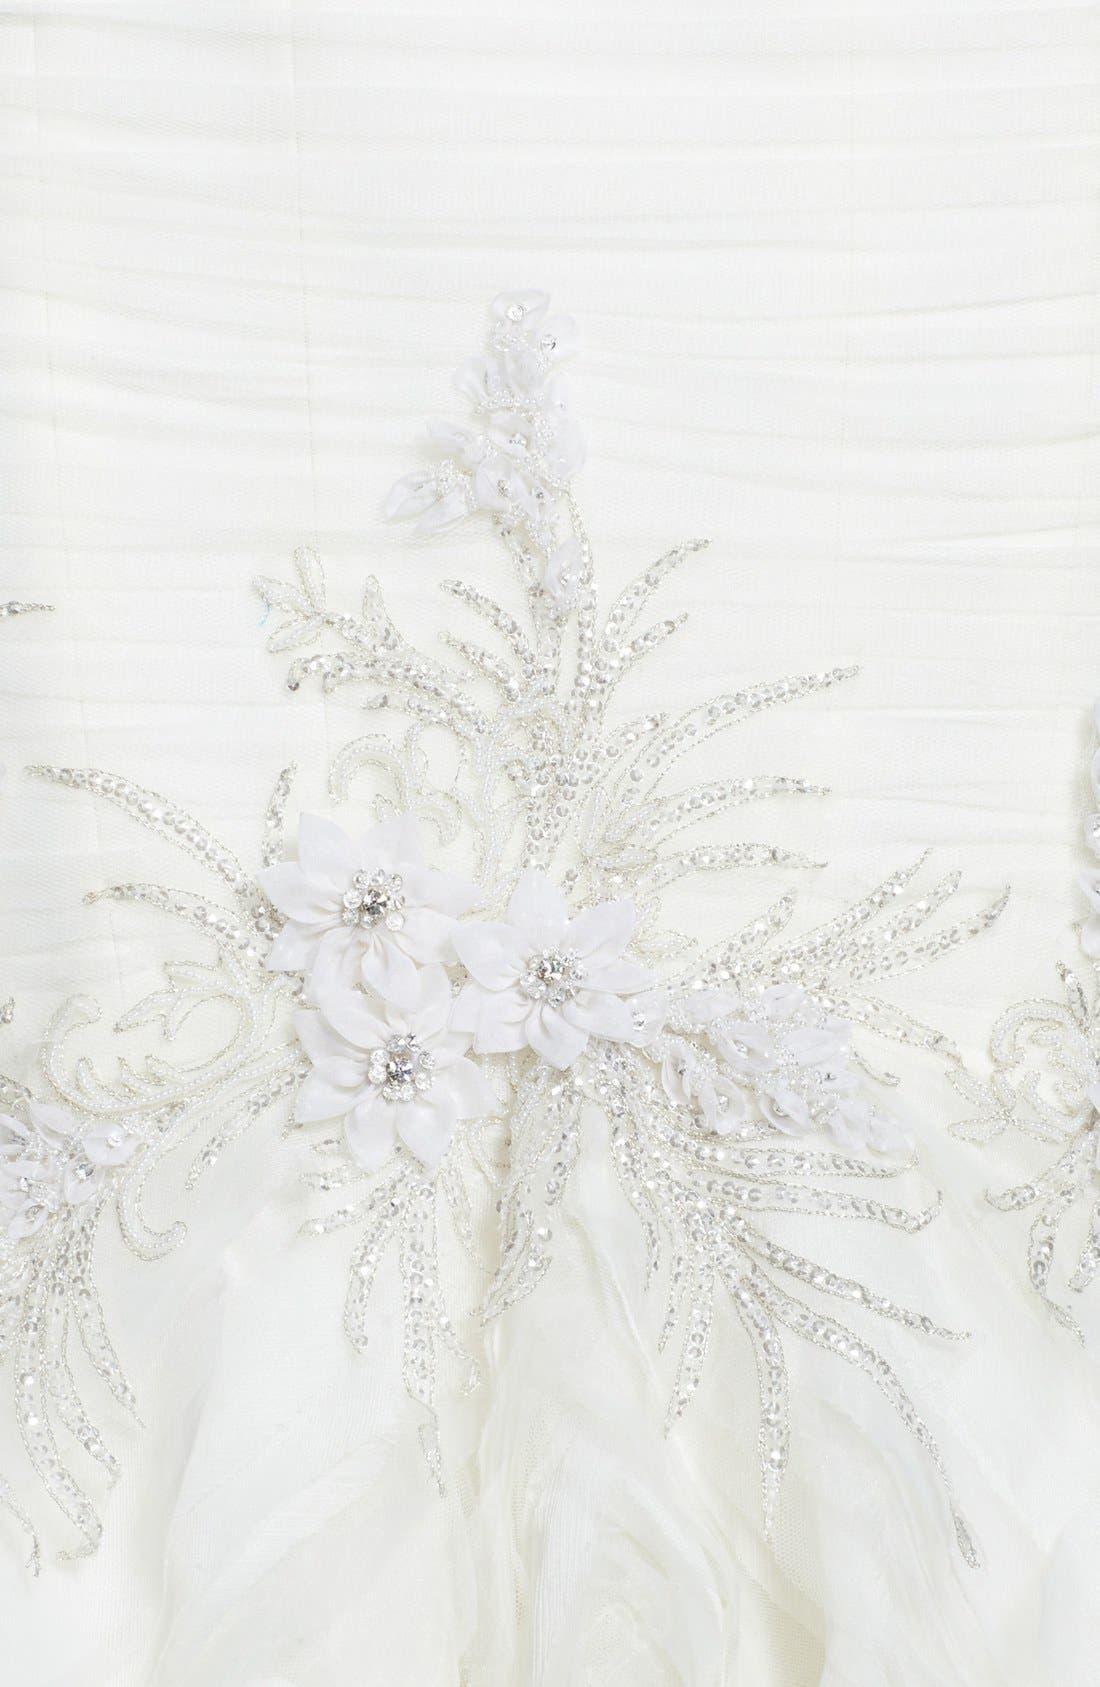 Alternate Image 3  - Badgley Mischka Bridal 'Bridgette' Embellished Tulle Mermaid Dress (In Stores Only)